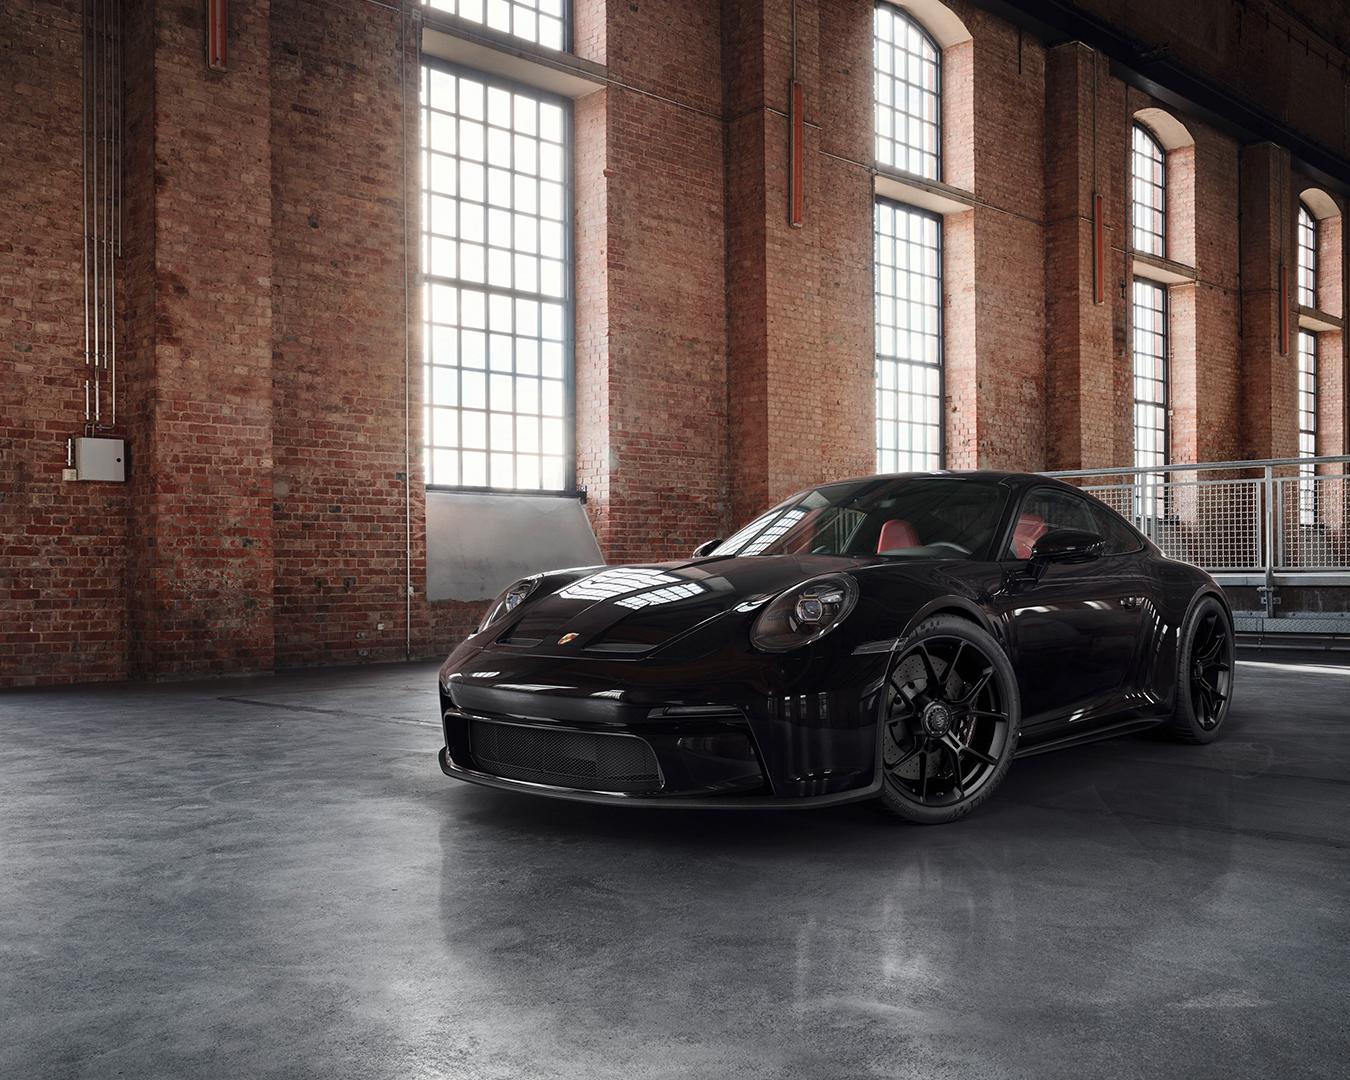 Porsche-911-GT3-Touring-by-Porsche-Exclusive-Manufaktur-3